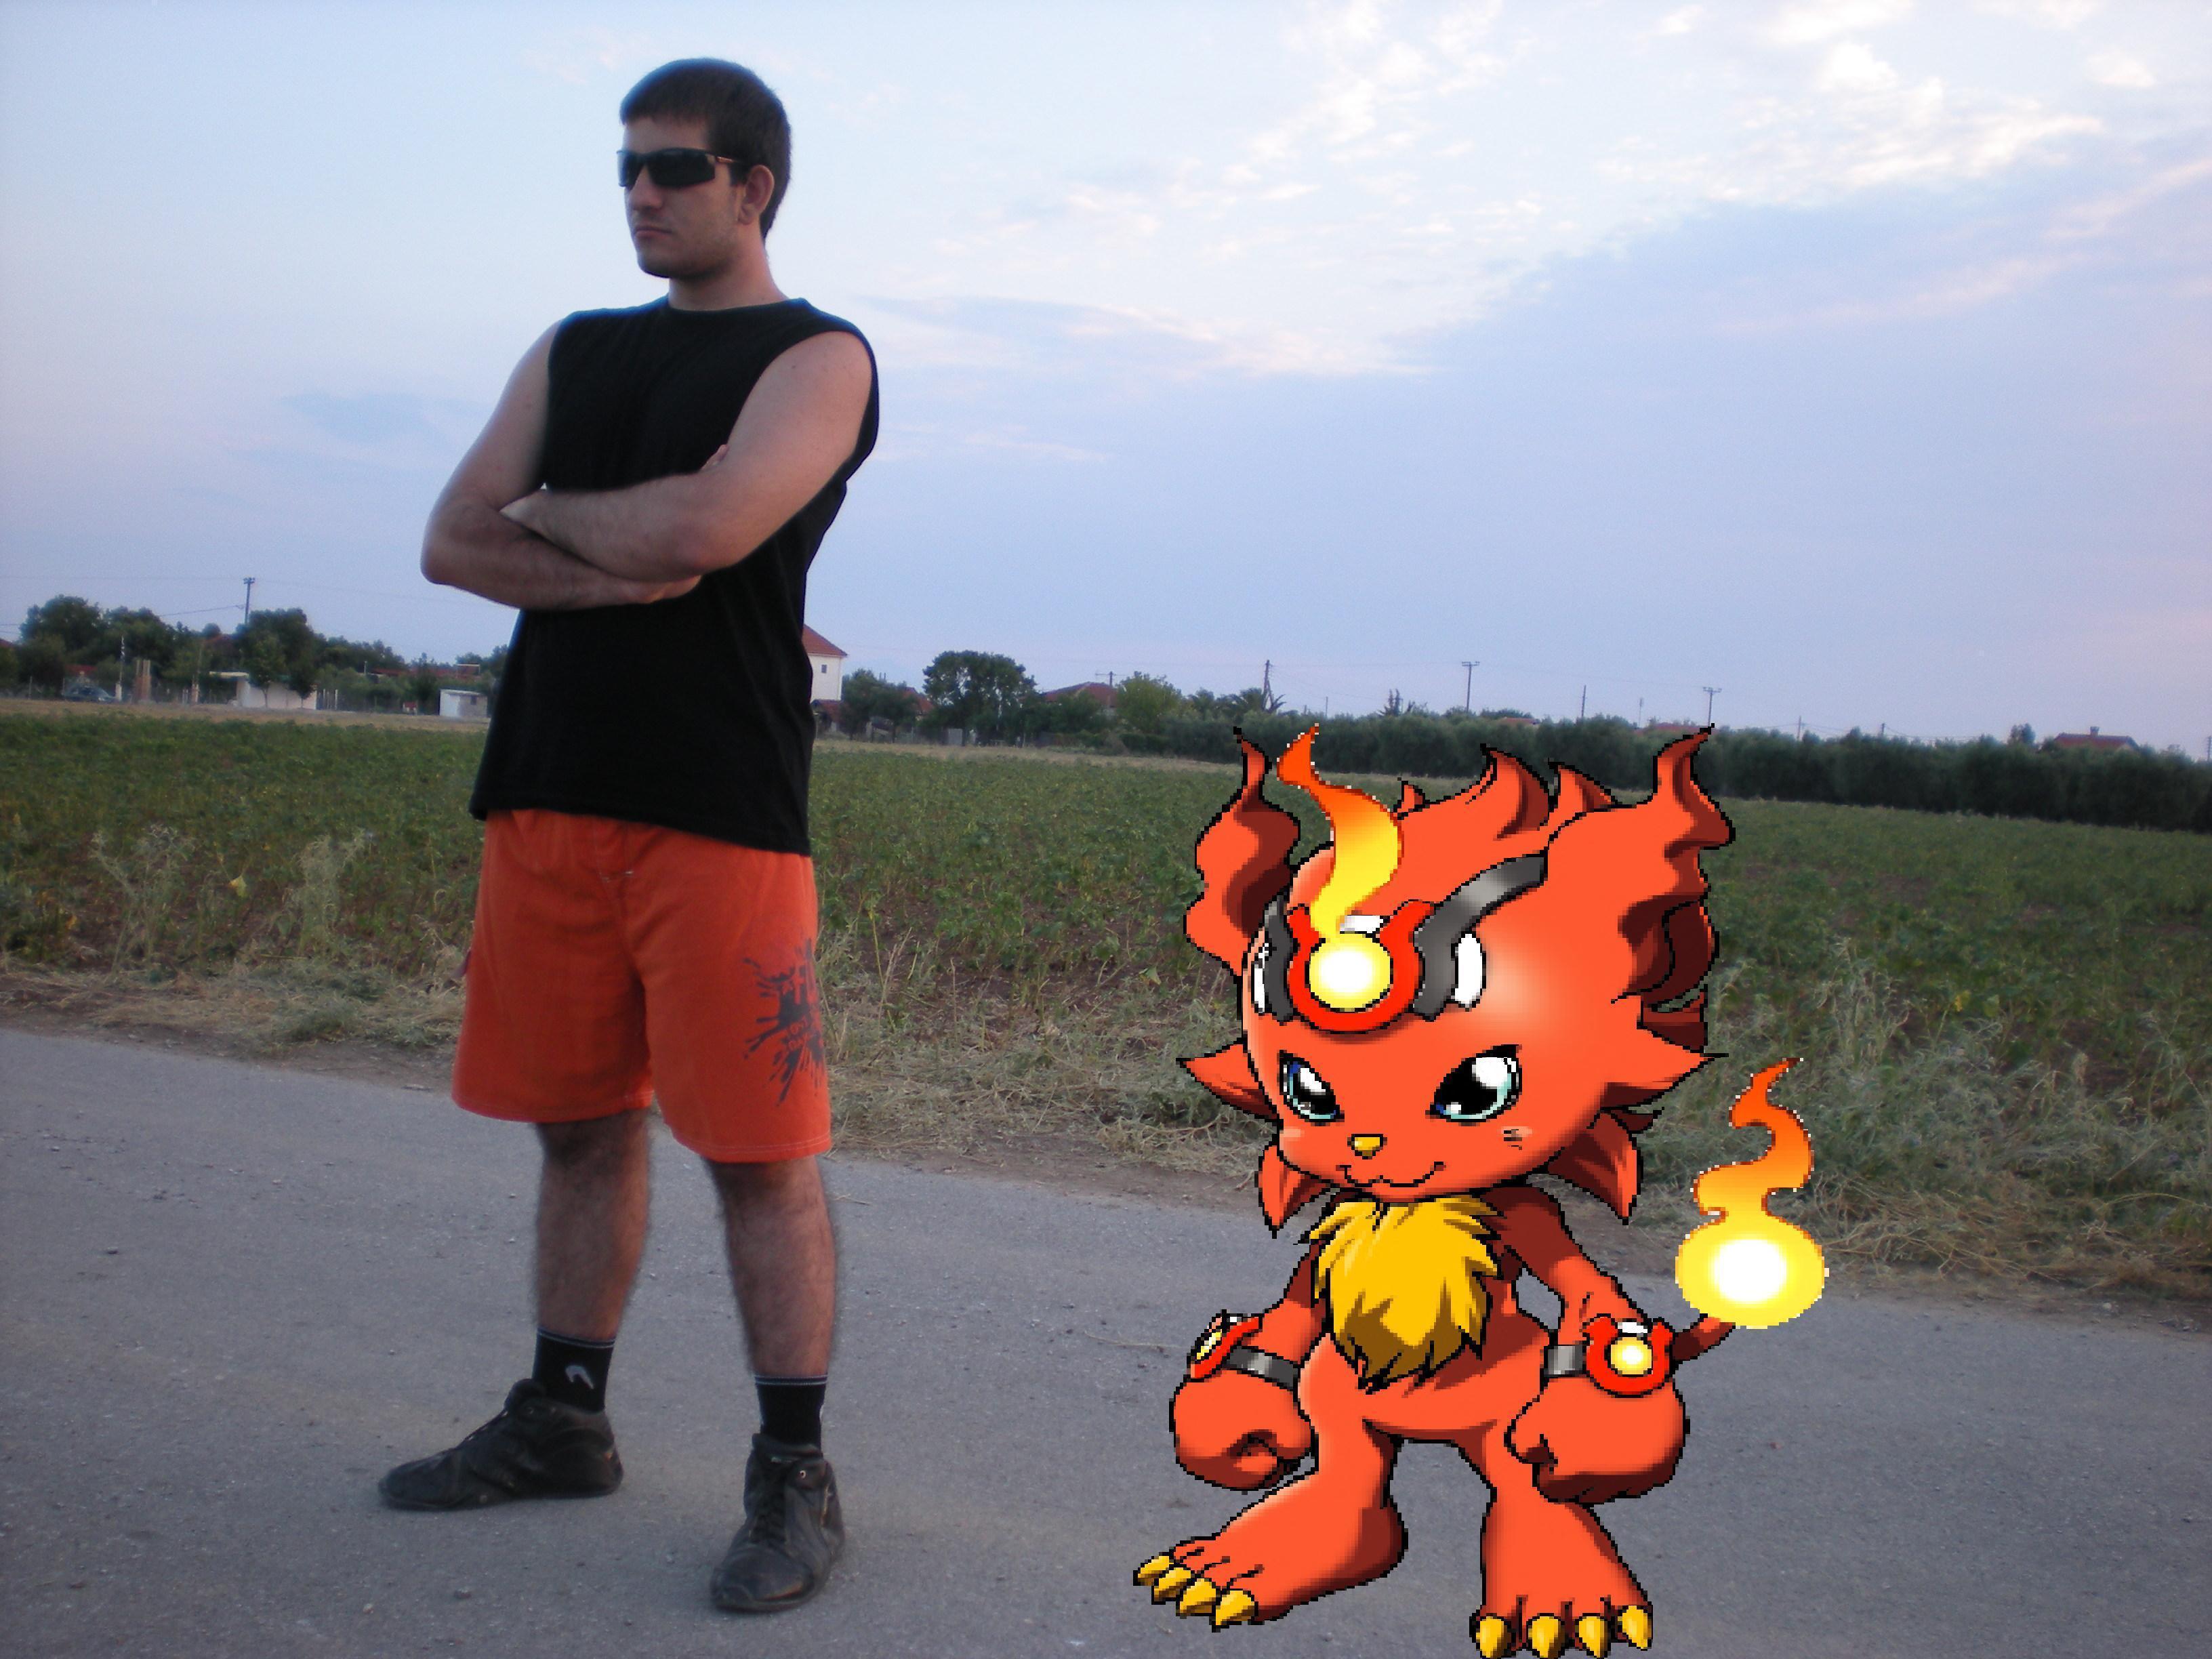 Digimon and Tamer by Bigjim3D